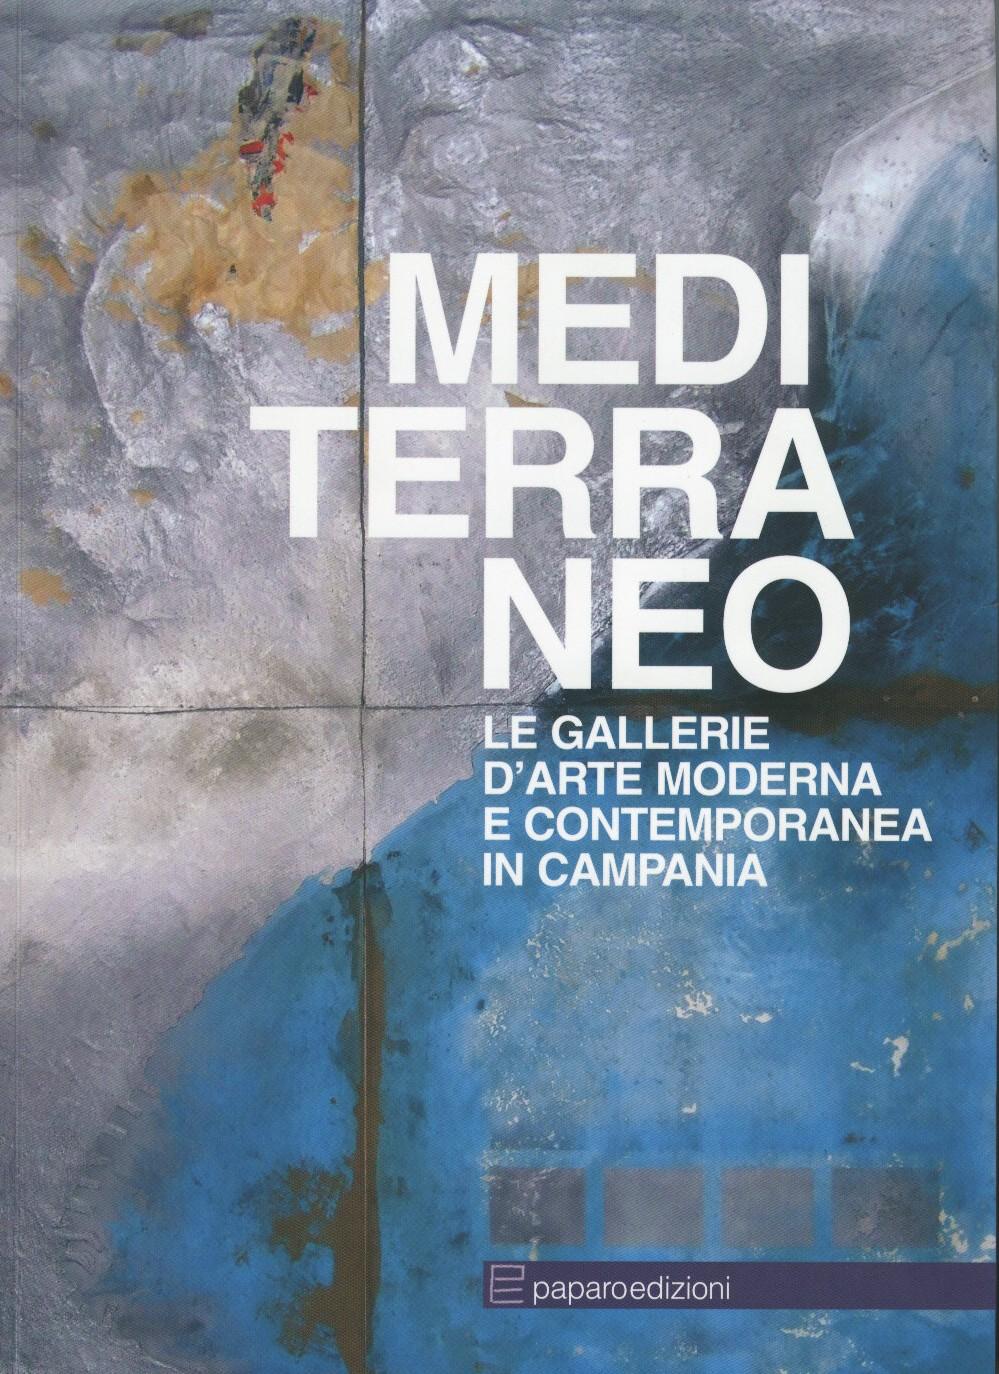 marciano-arte-mediterraneo-gallerie-d-arte